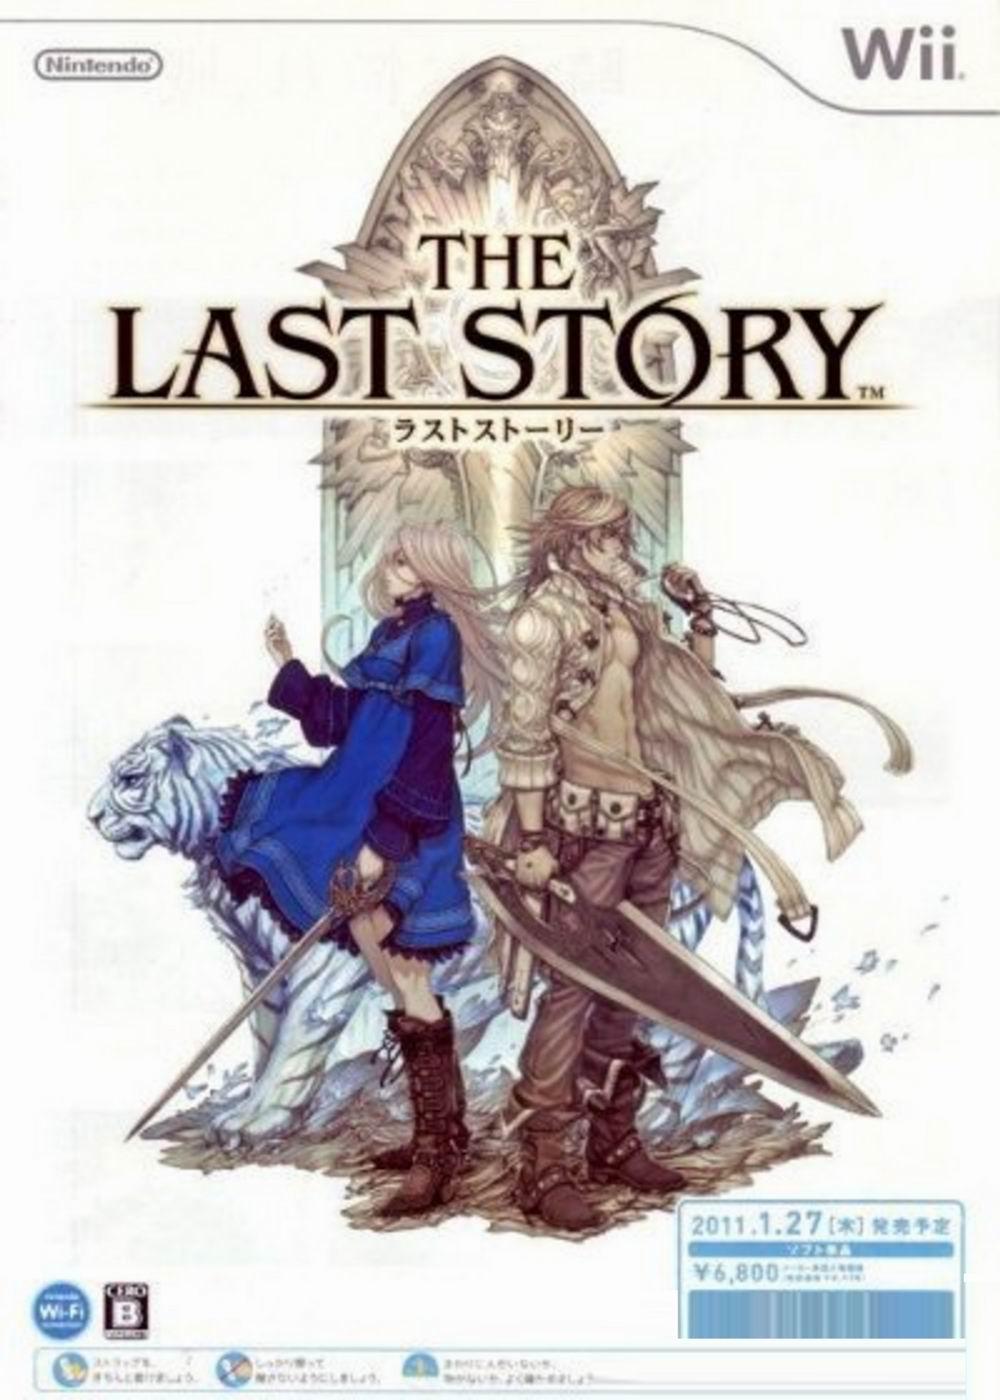 [WII]wii 最后的故事下载 最后的故事汉化版下载